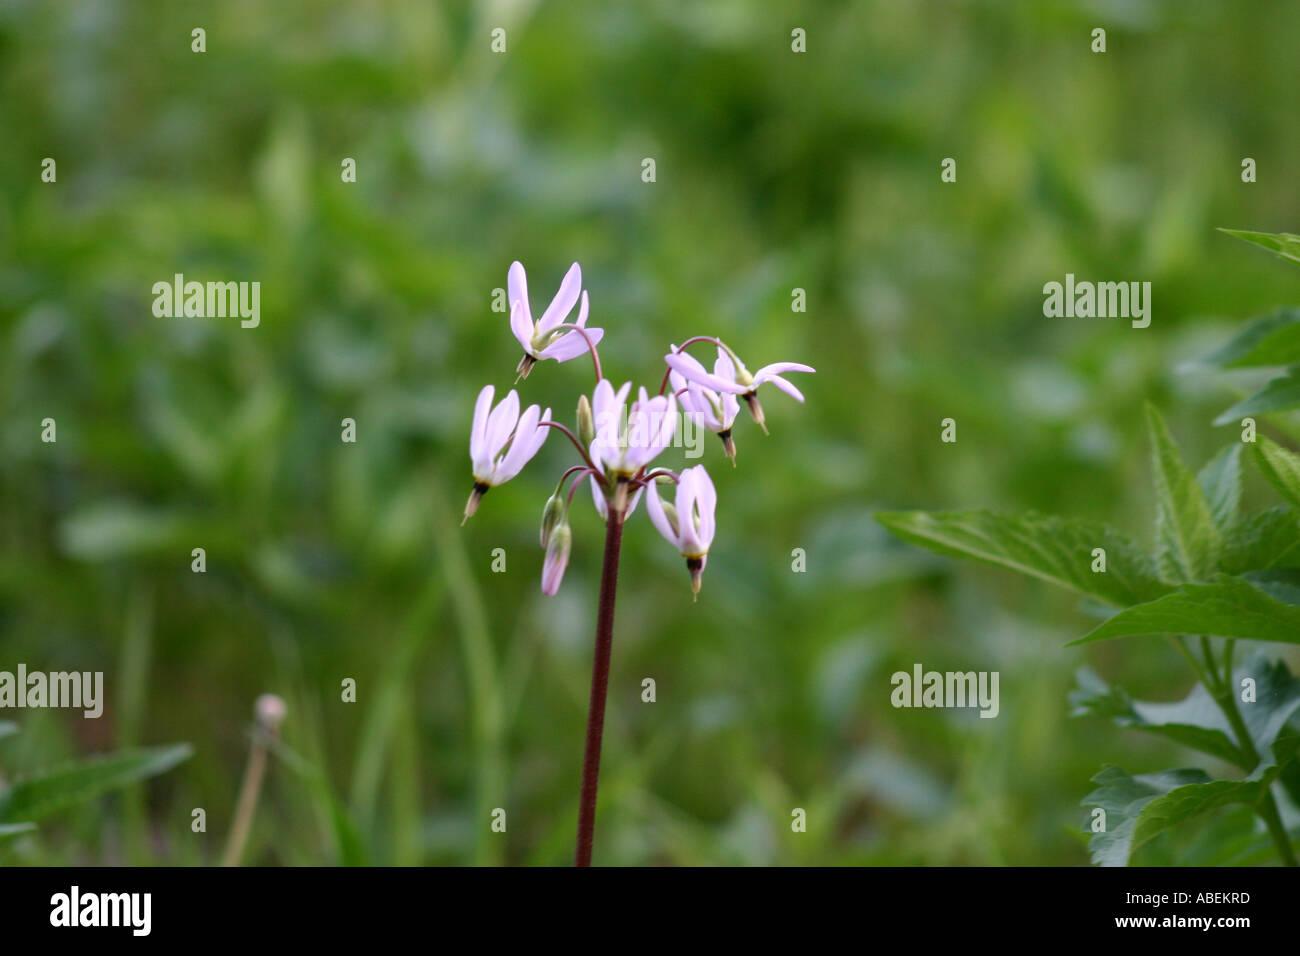 Shooting Star blossoms - Stock Image